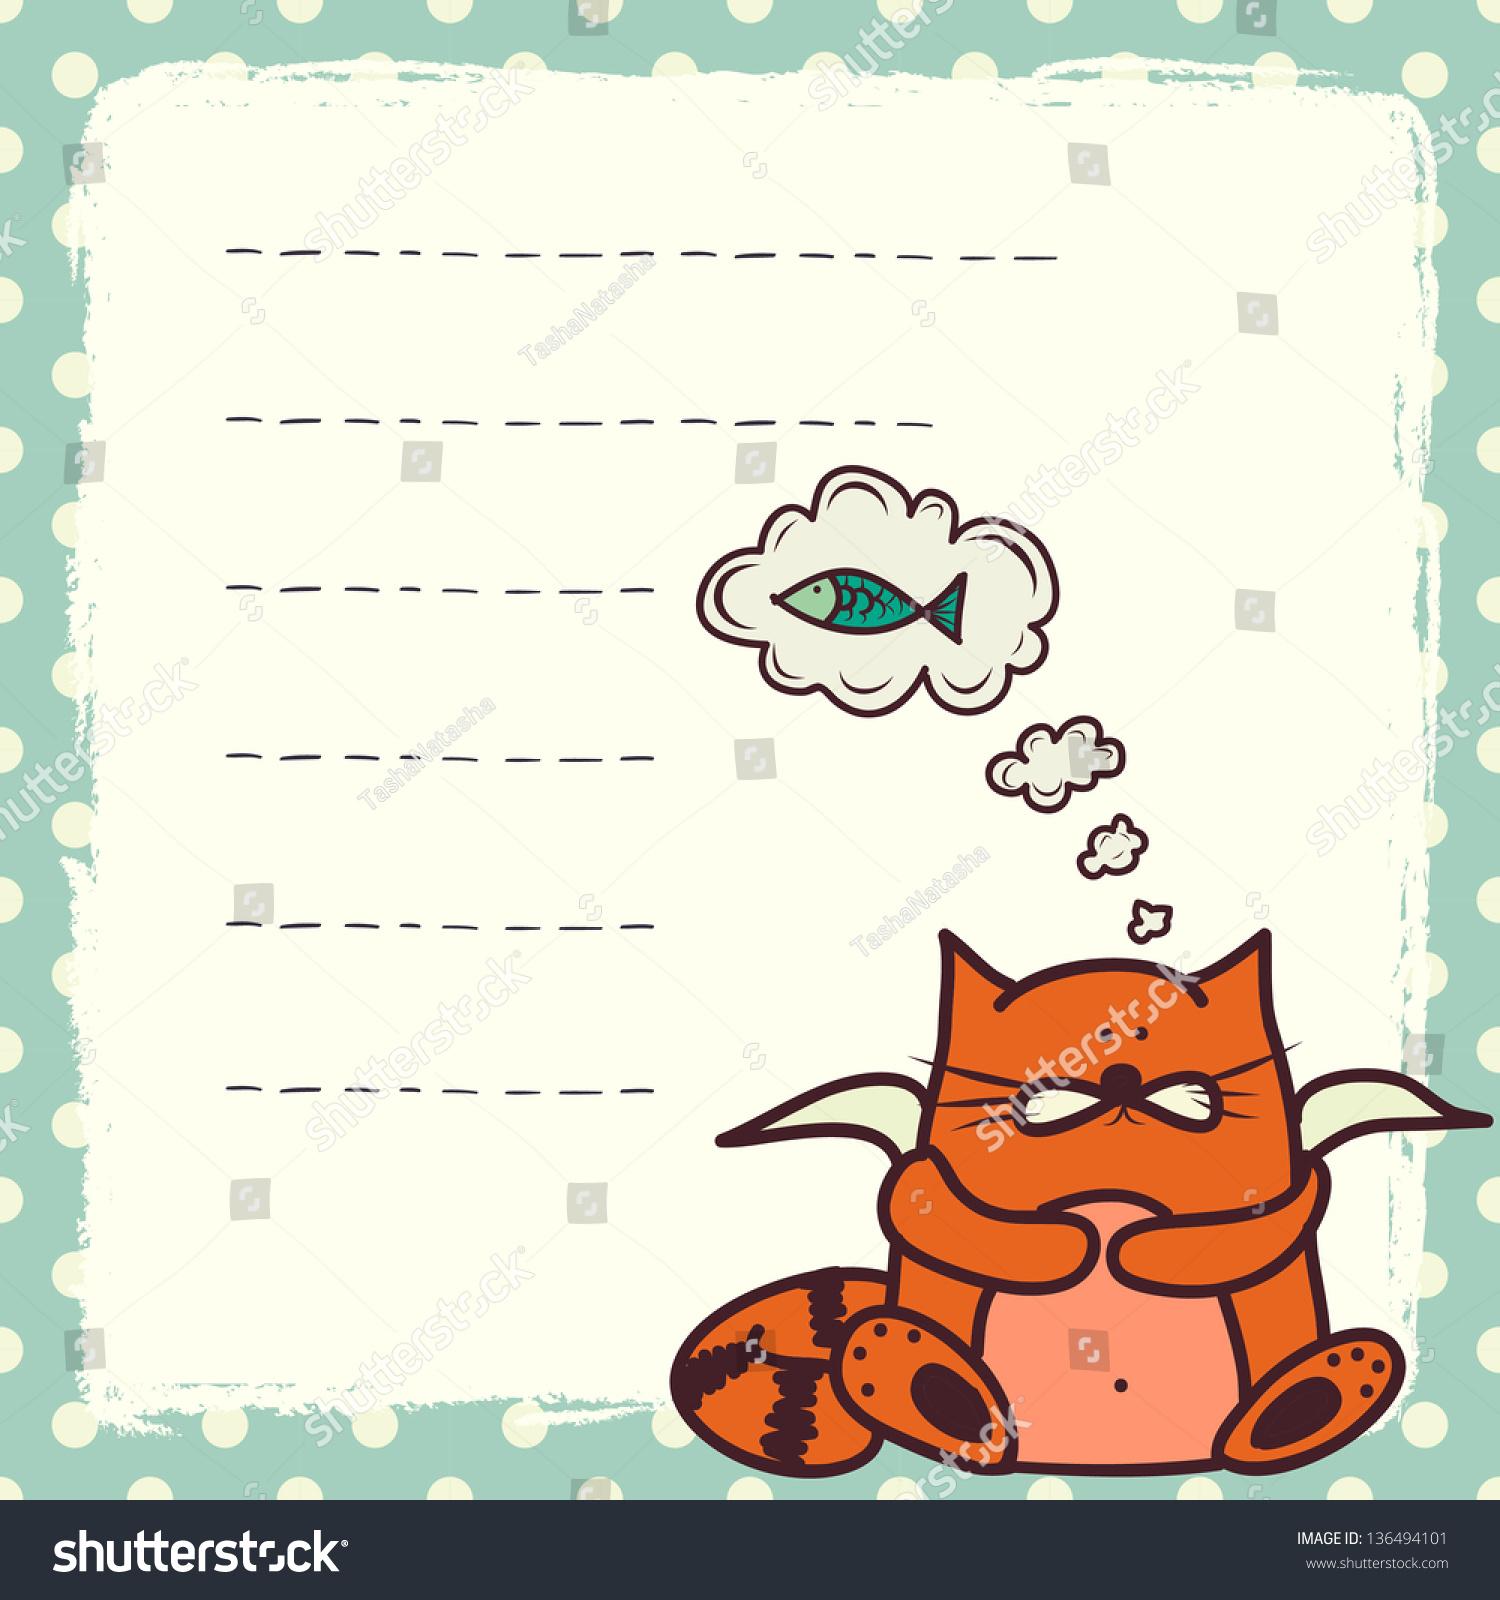 Card Note Template Cute Doodle Cartoon Vector 136494101 – Note Template